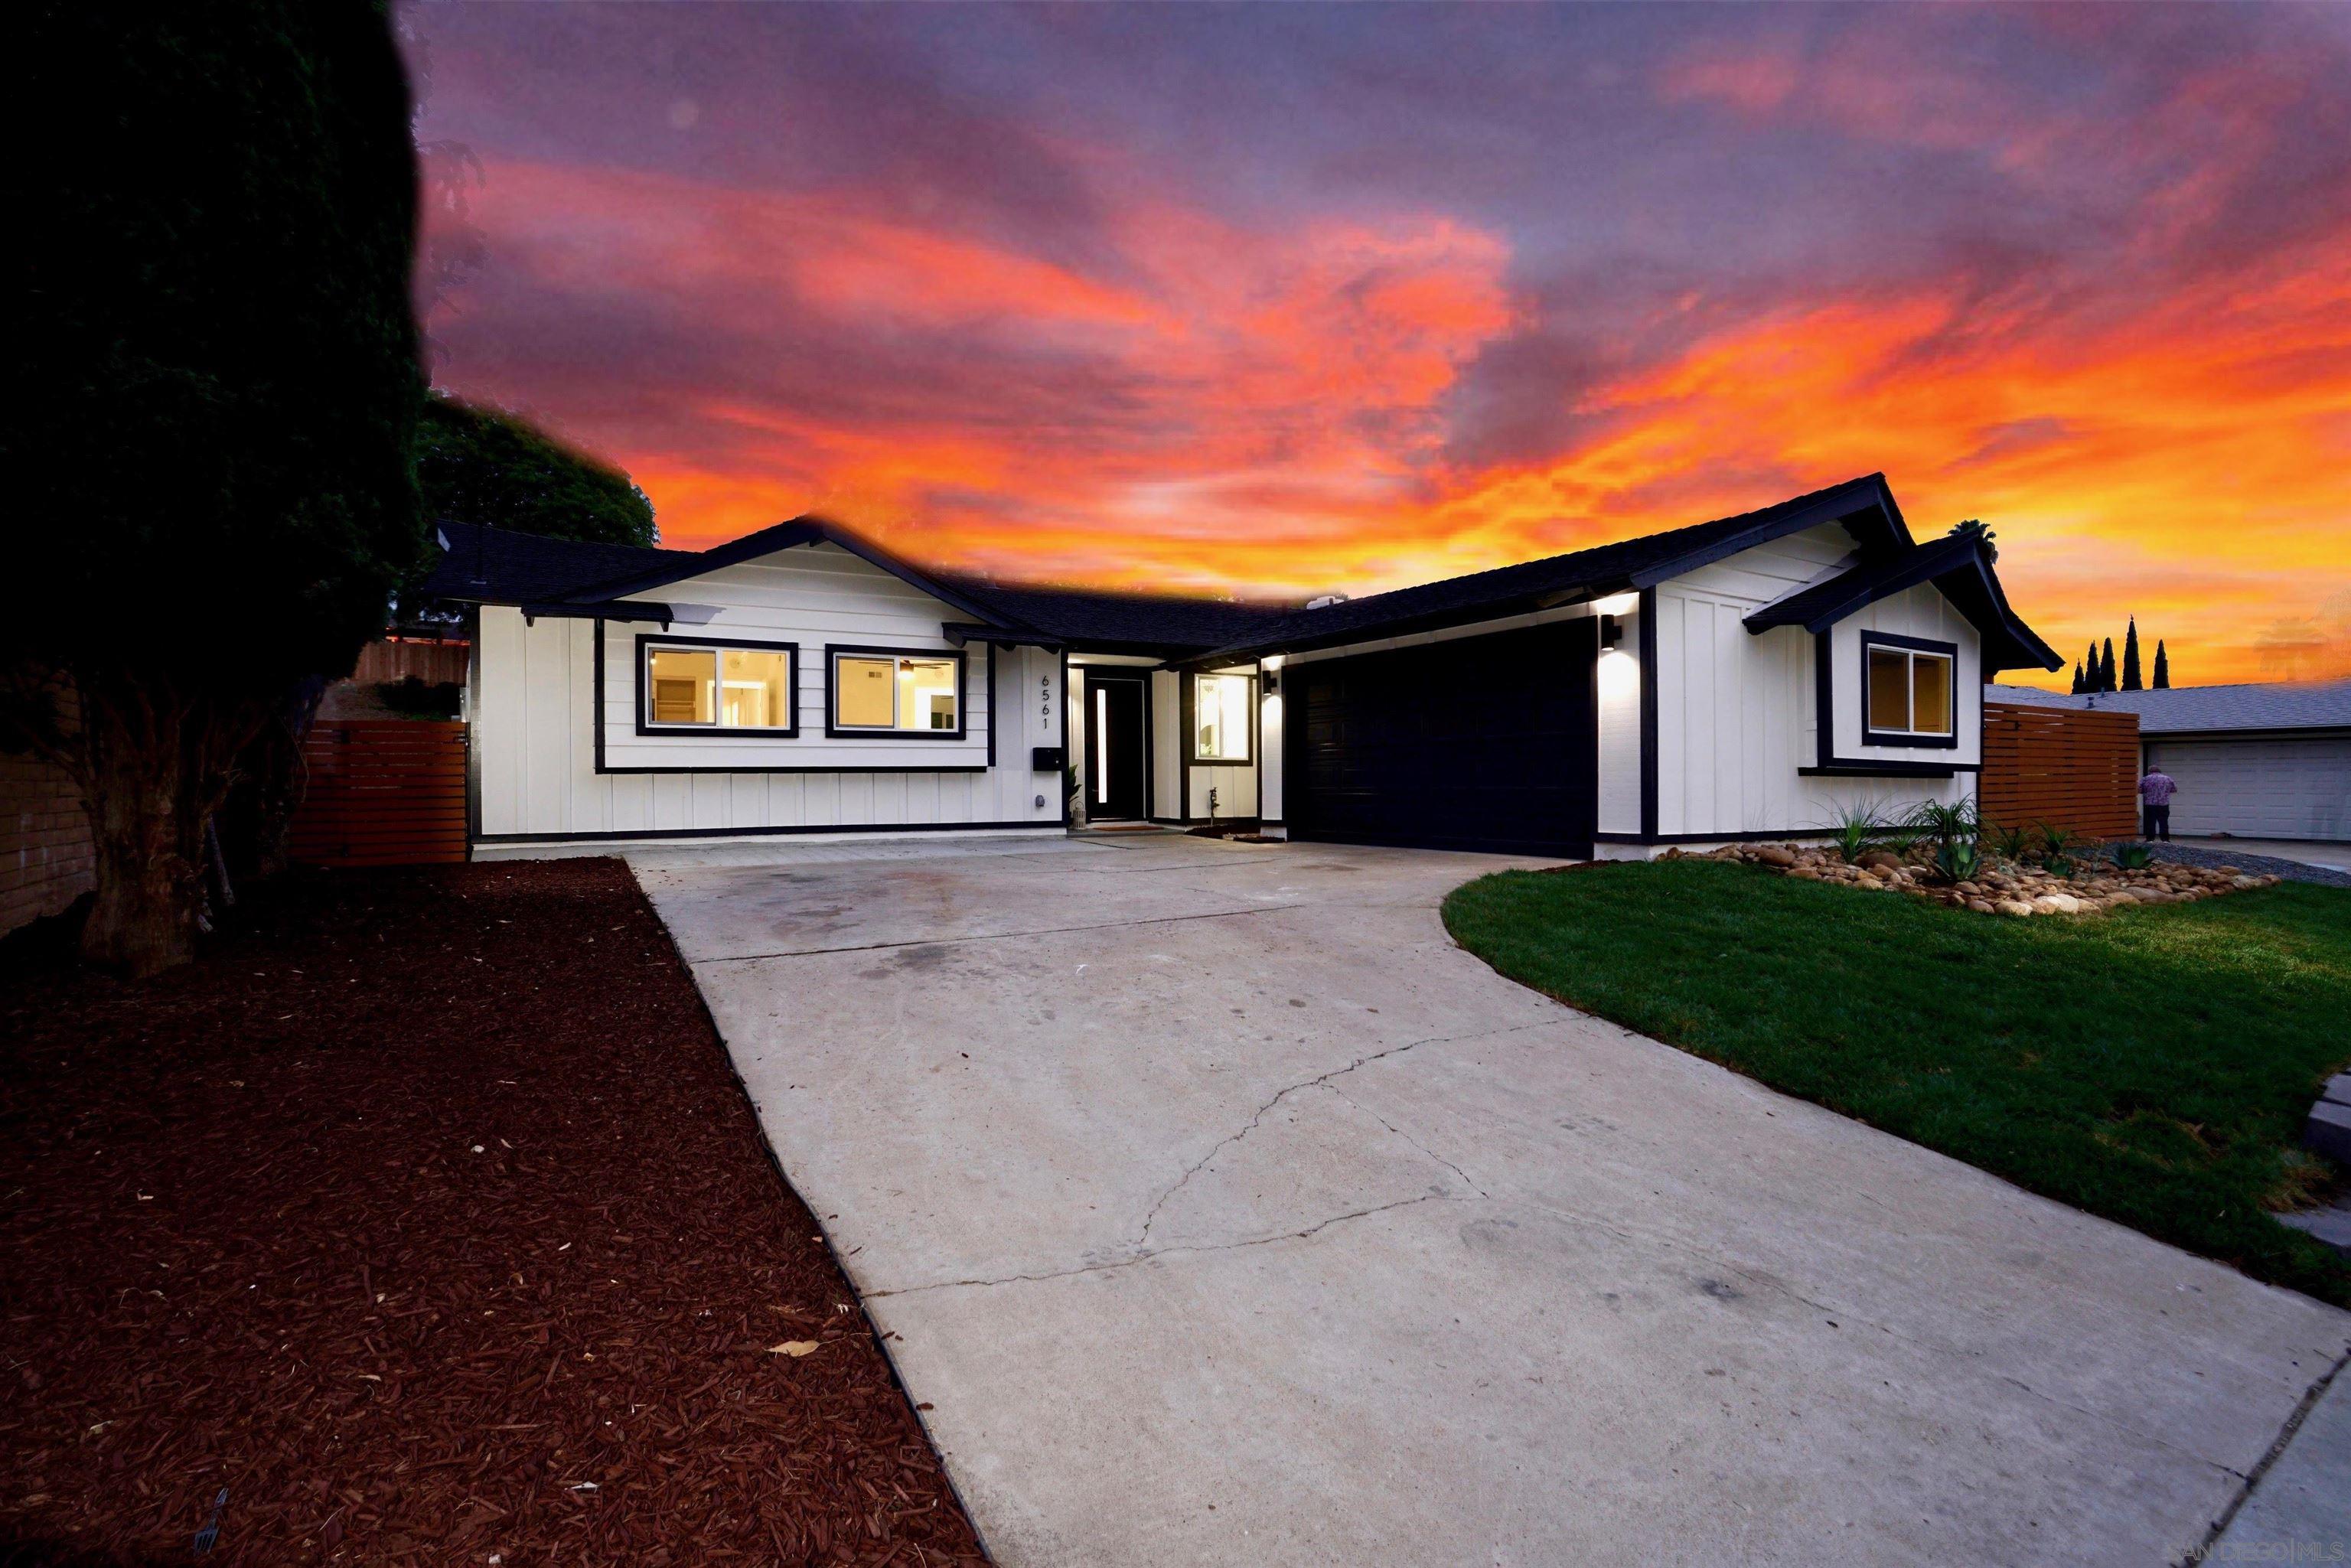 6561 Cowles Mt, San Diego, CA 92119